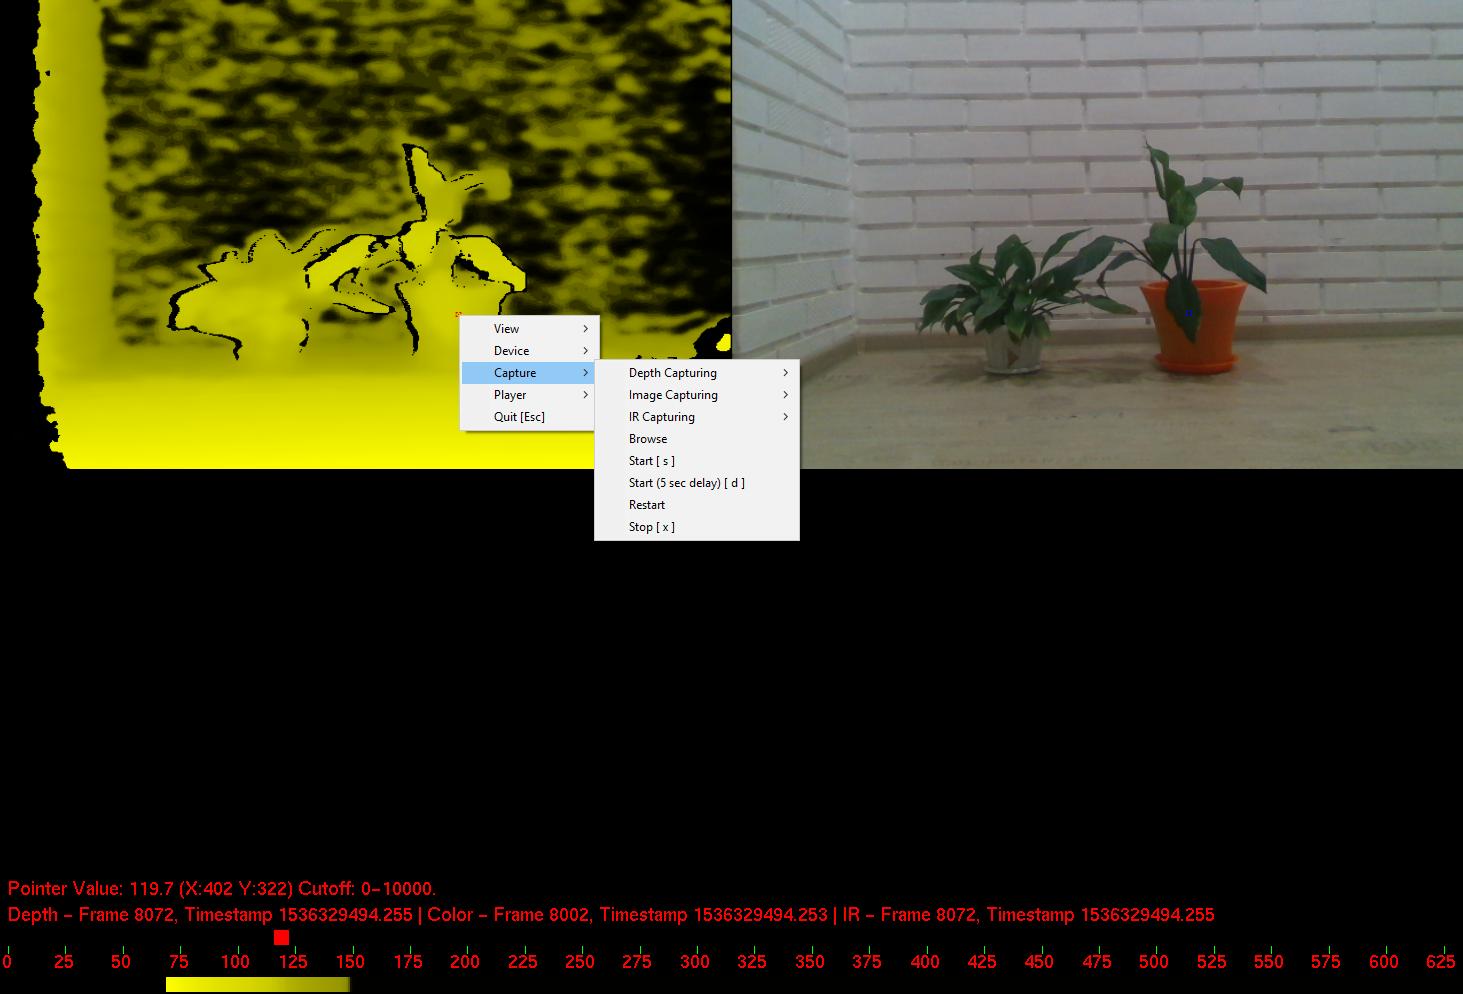 Configuring capture